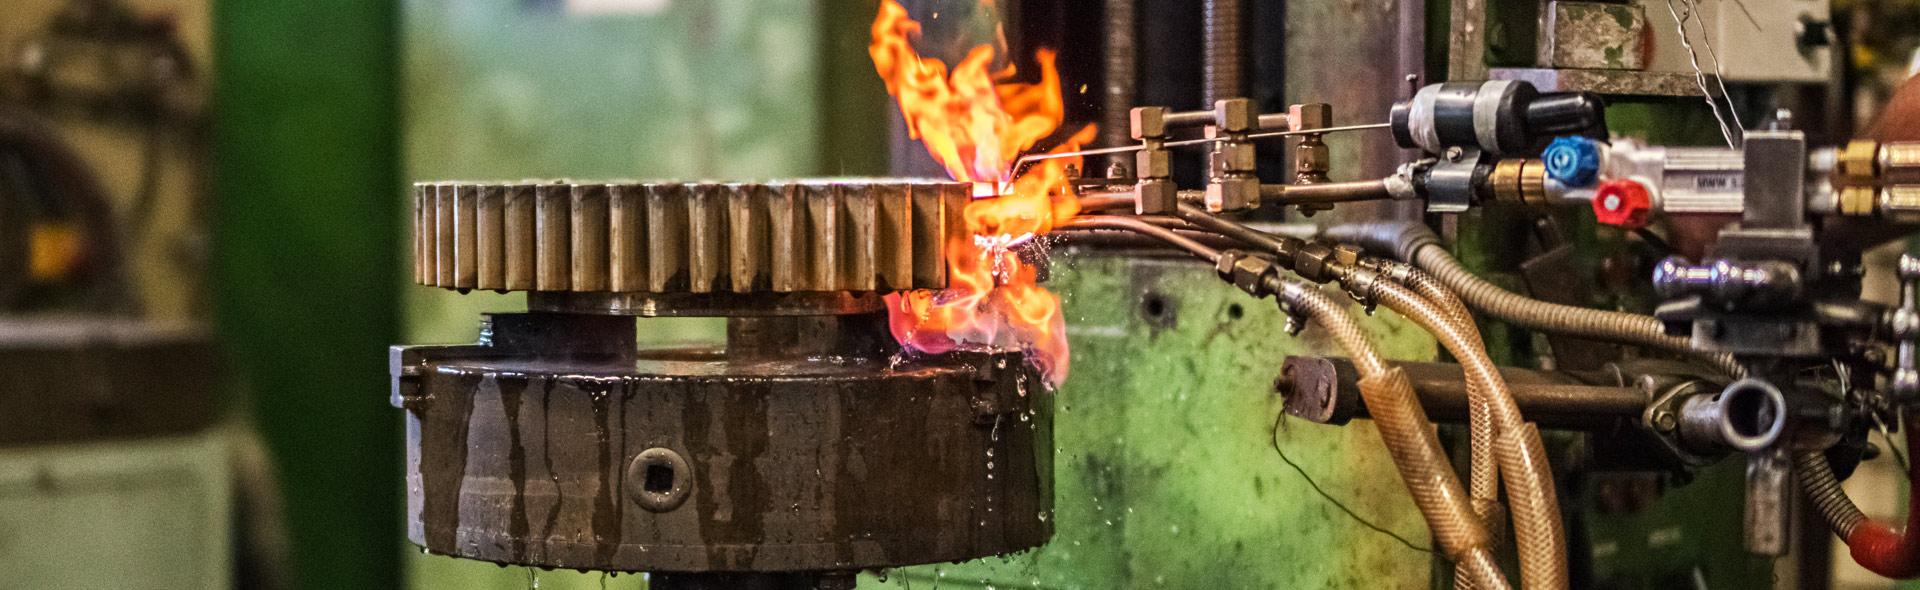 Bearbeitung | Maschinenbau Mundil GmbH & Co. KG